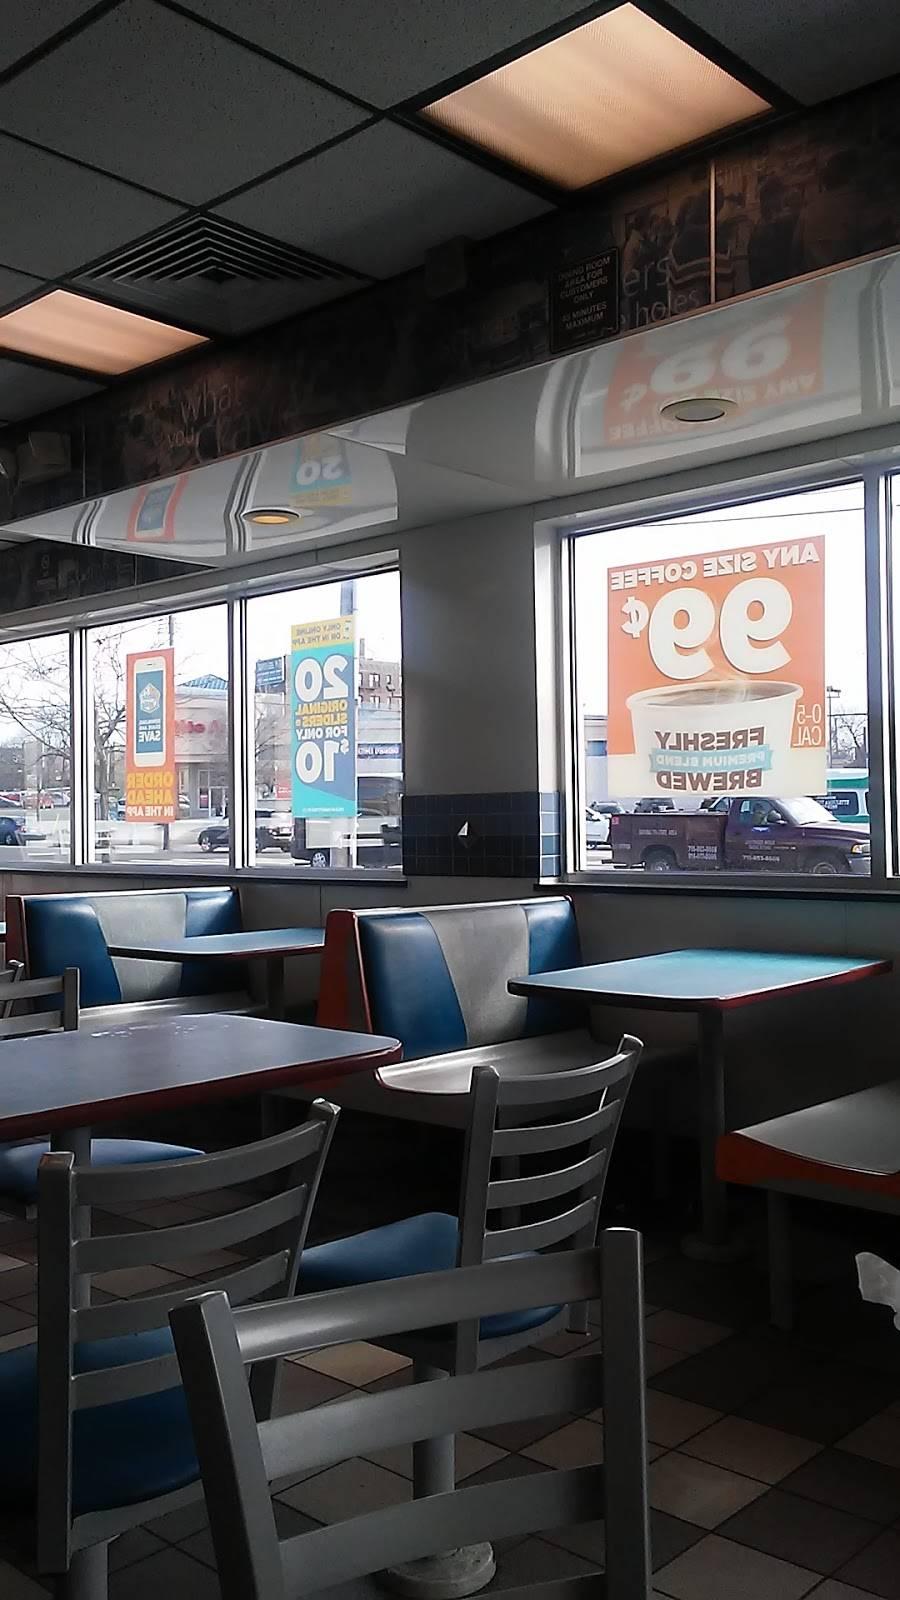 White Castle | restaurant | 2701 Boston Rd, Bronx, NY 10467, USA | 7182314978 OR +1 718-231-4978